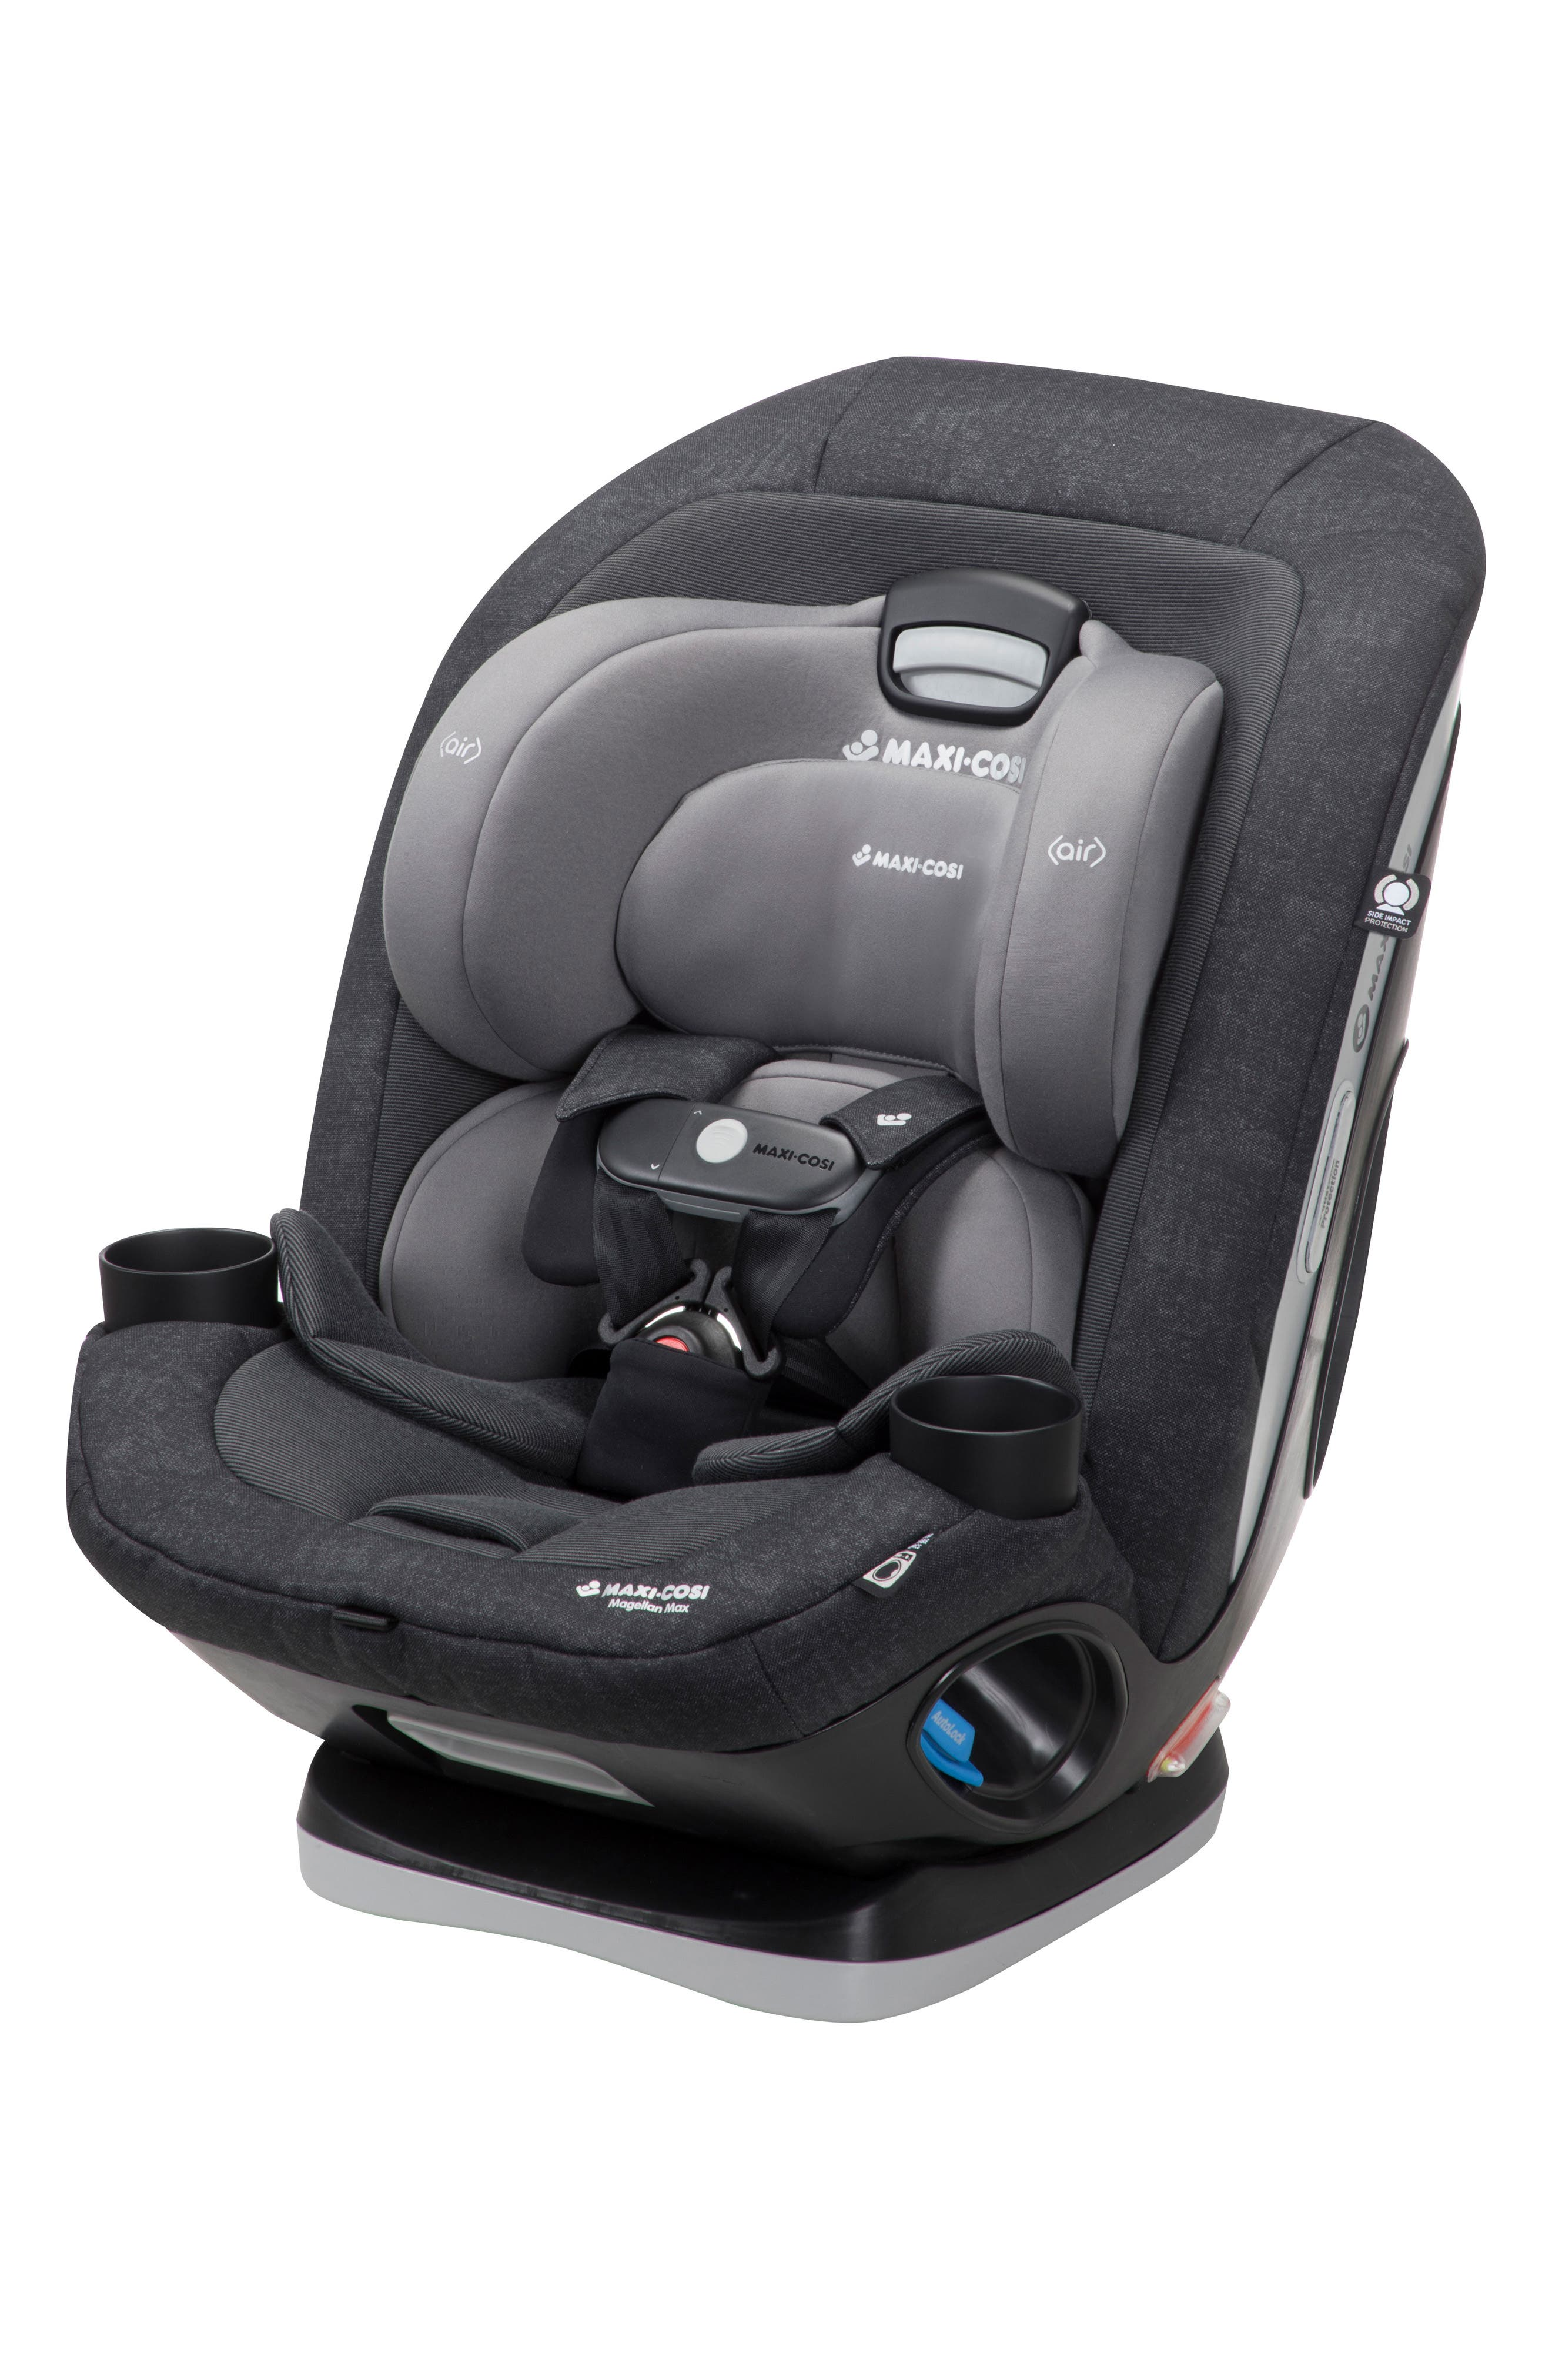 Magellan Max 2018 5-in-1 Convertible Car Seat,                             Alternate thumbnail 5, color,                             Nomad Black